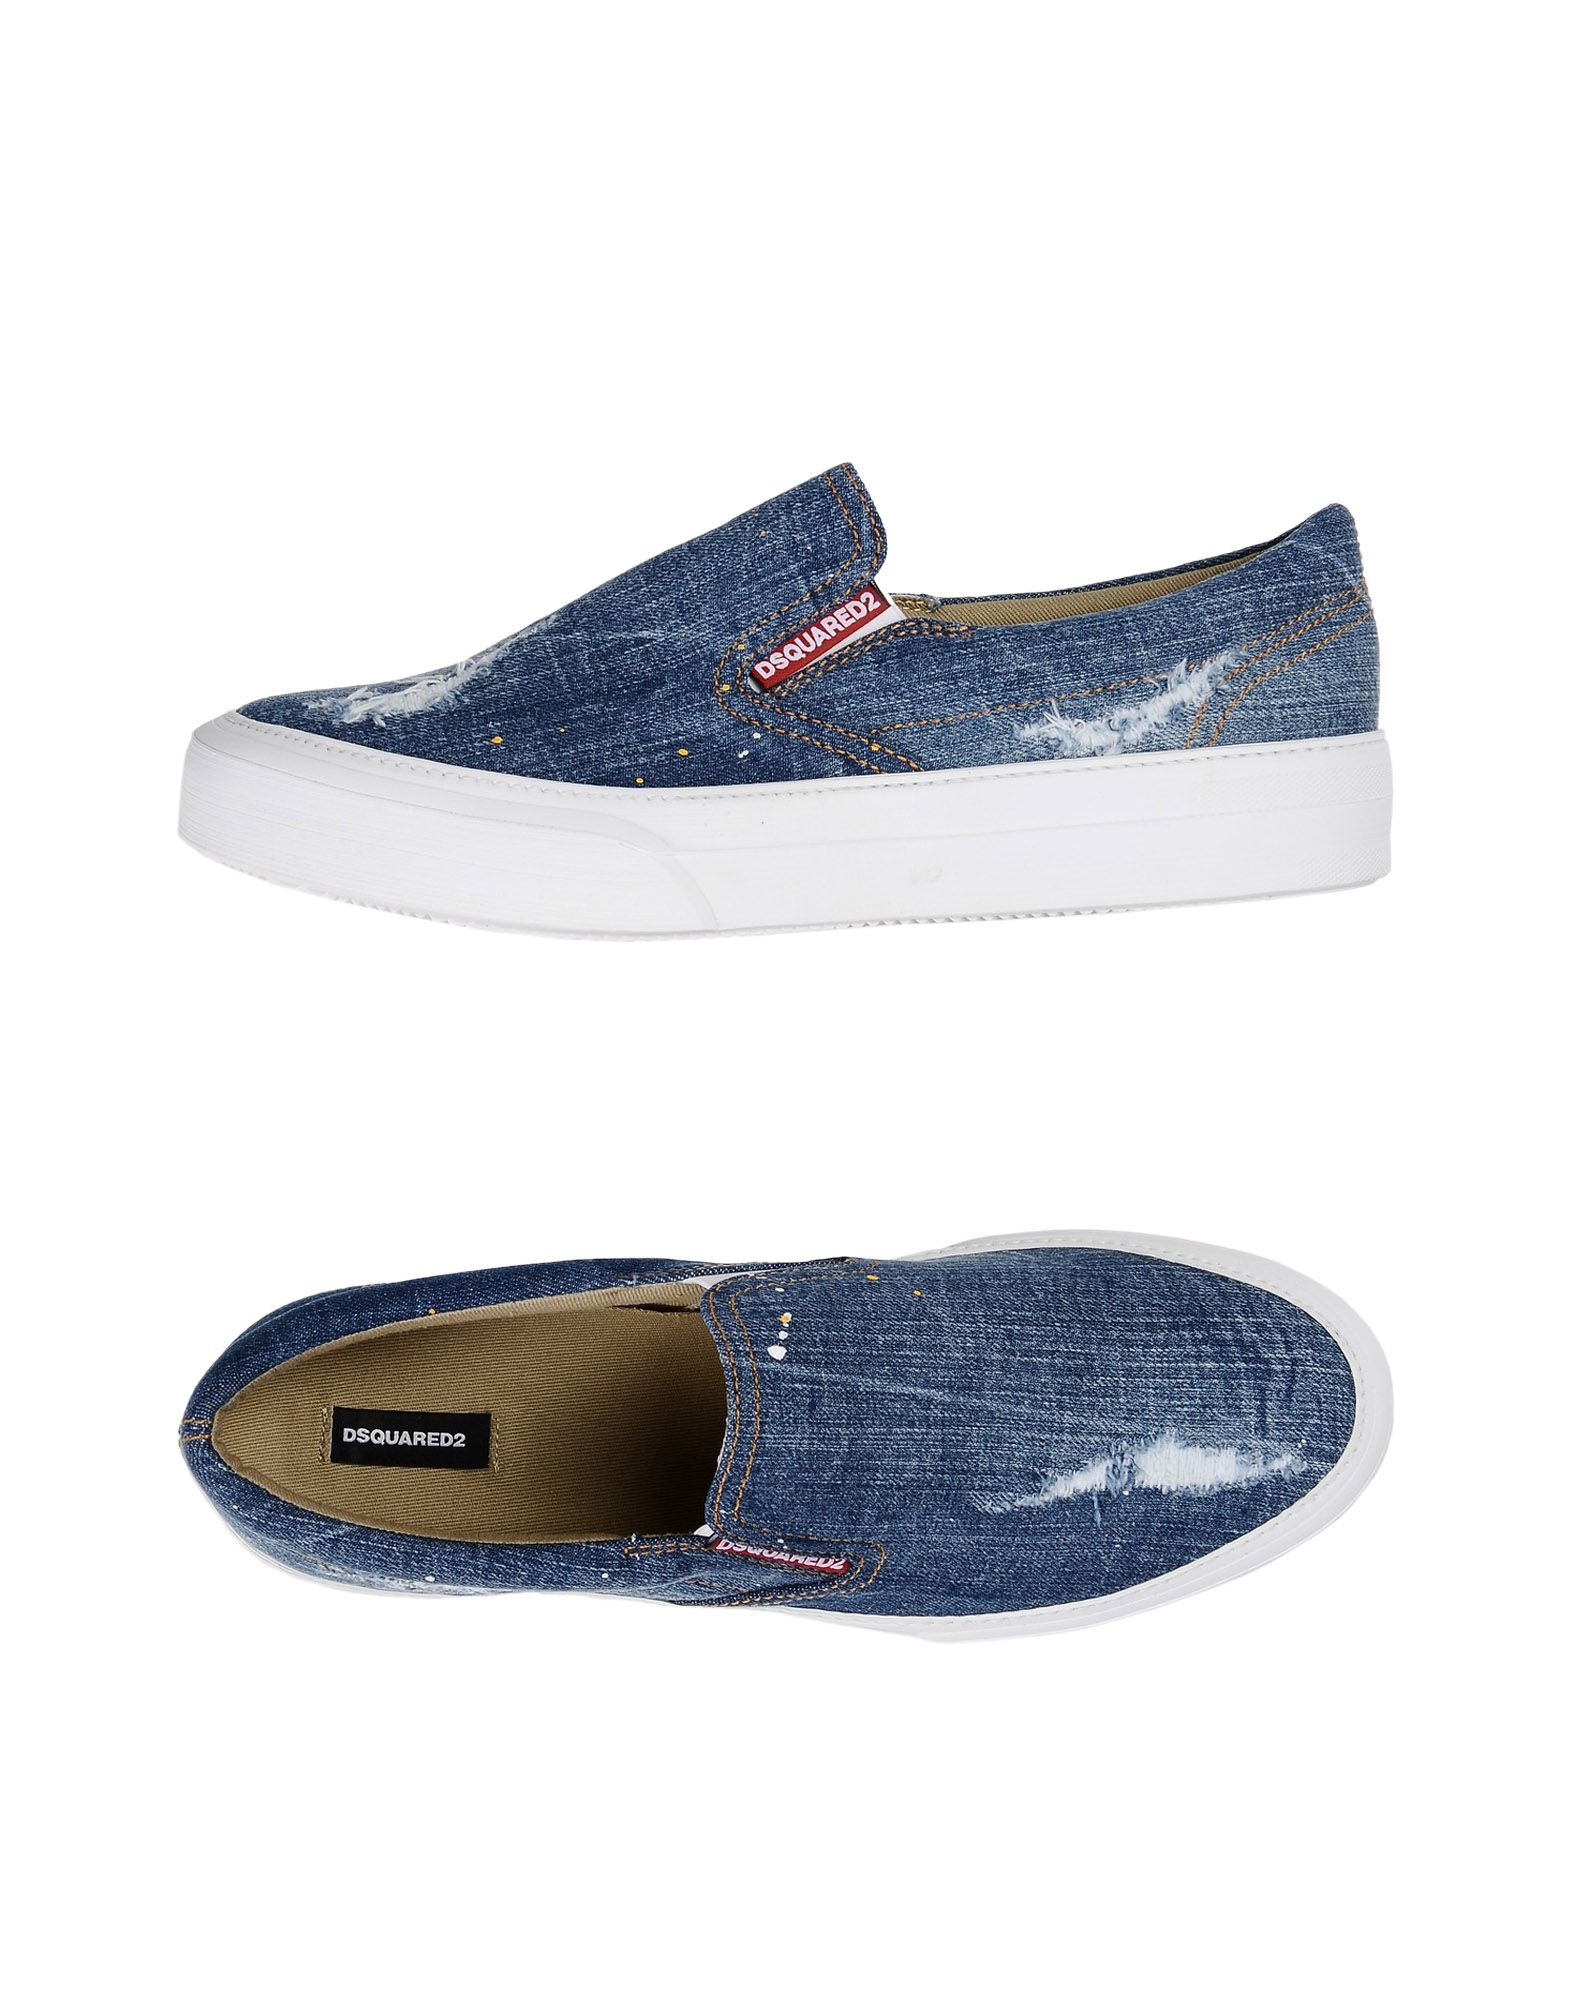 Dsquared2 Sneakers Herren  11411462HC Gute Qualität beliebte Schuhe